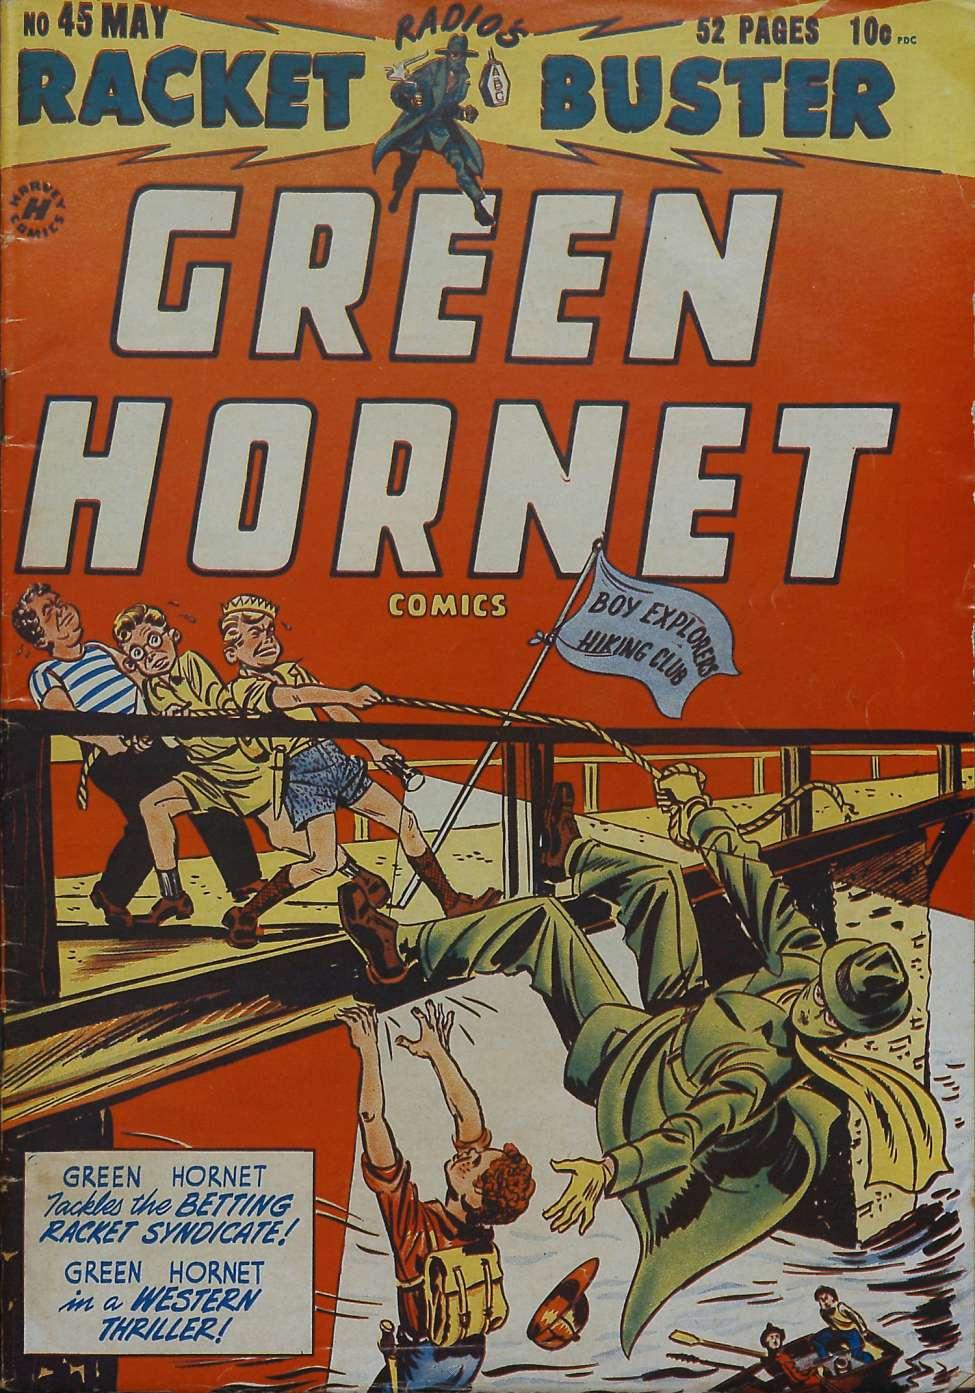 Comic Book Cover For Green Hornet, Racket Buster #45